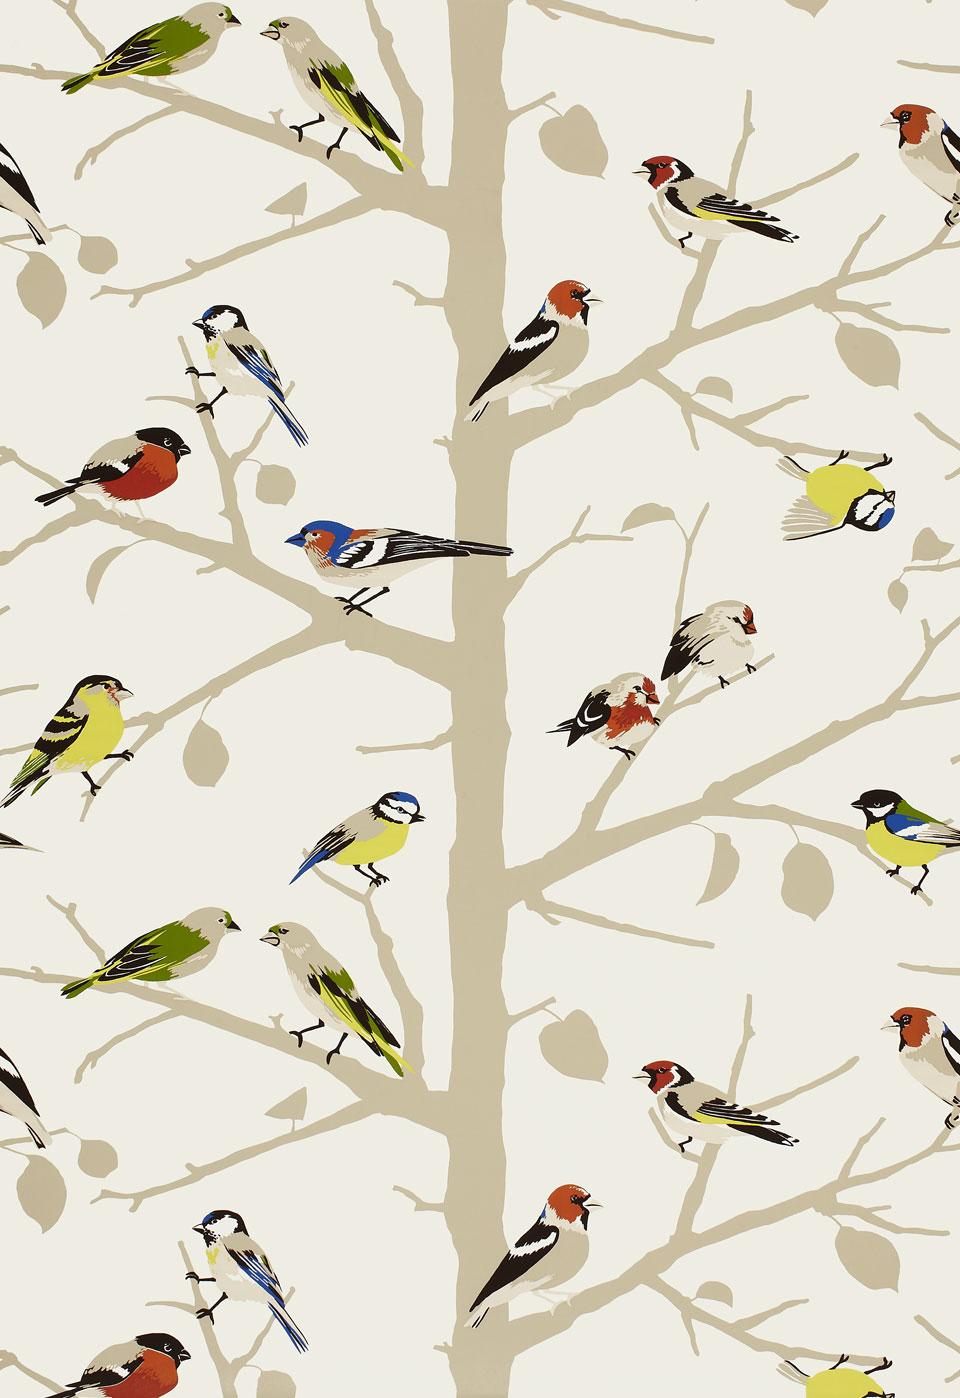 Bird House Wallpaper Border Free Hd Wallpapers